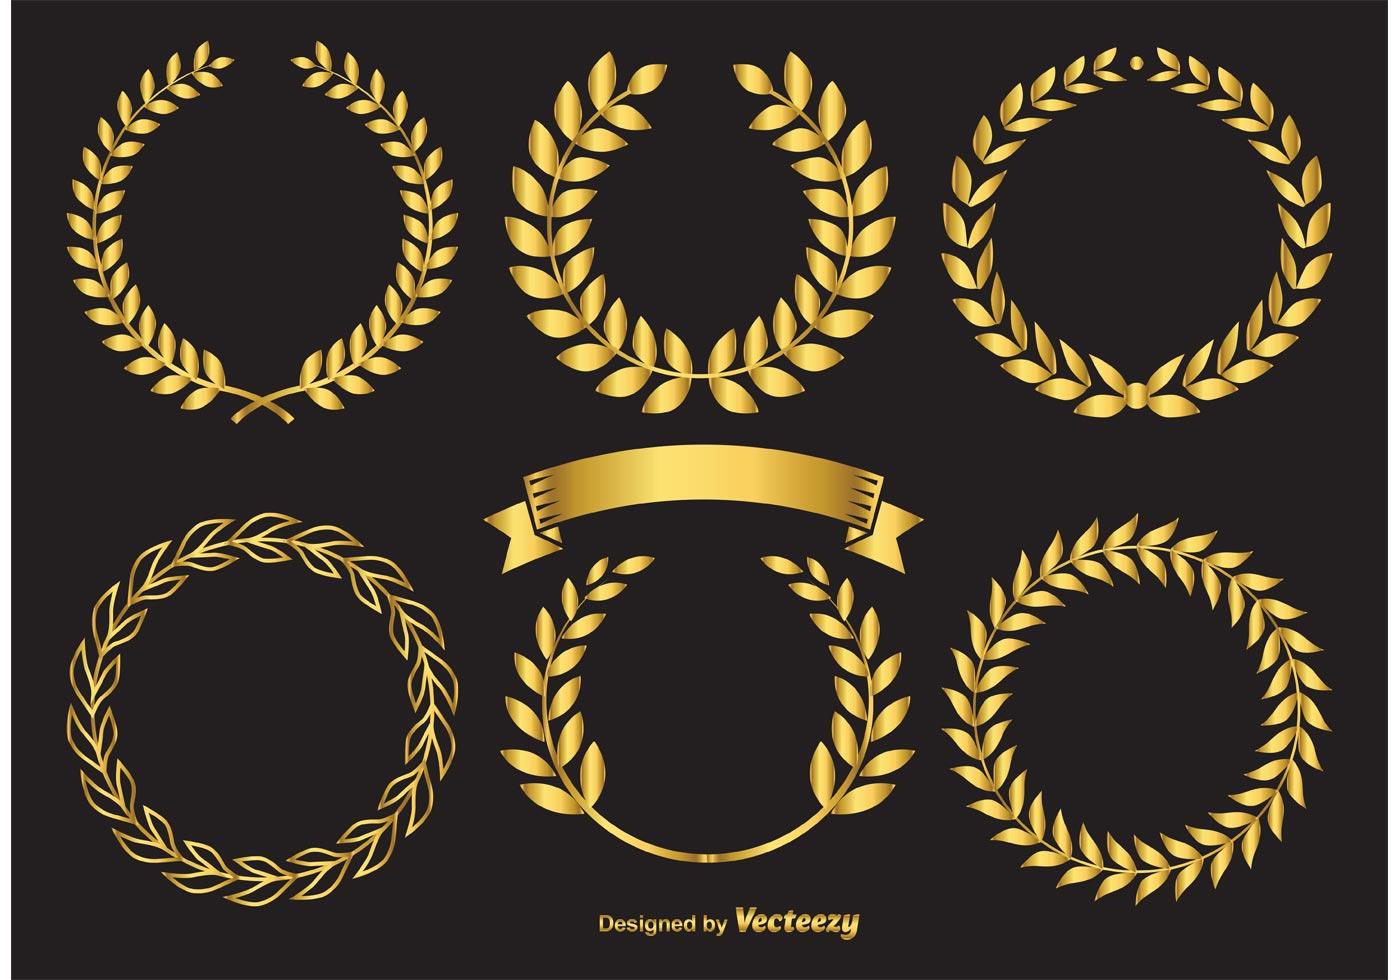 Golden laurel wreaths download free vector art stock for Laurel leaf crown template